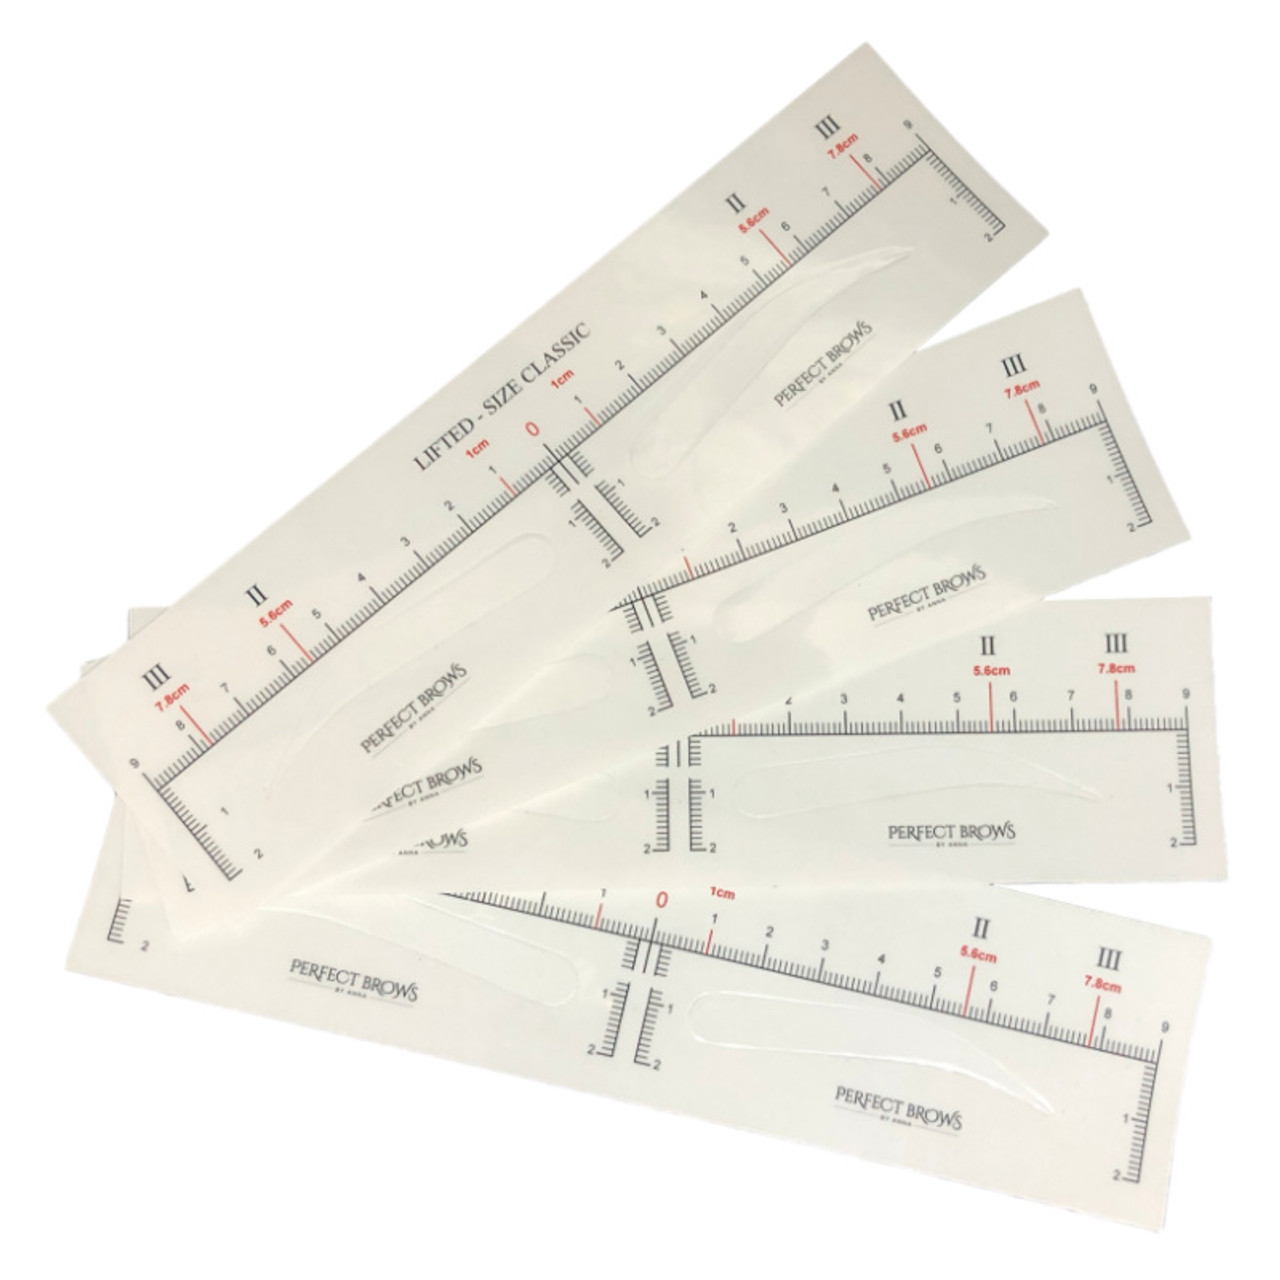 Permanent Makeup (PMU) Sticker Measuring Tool  4 Types